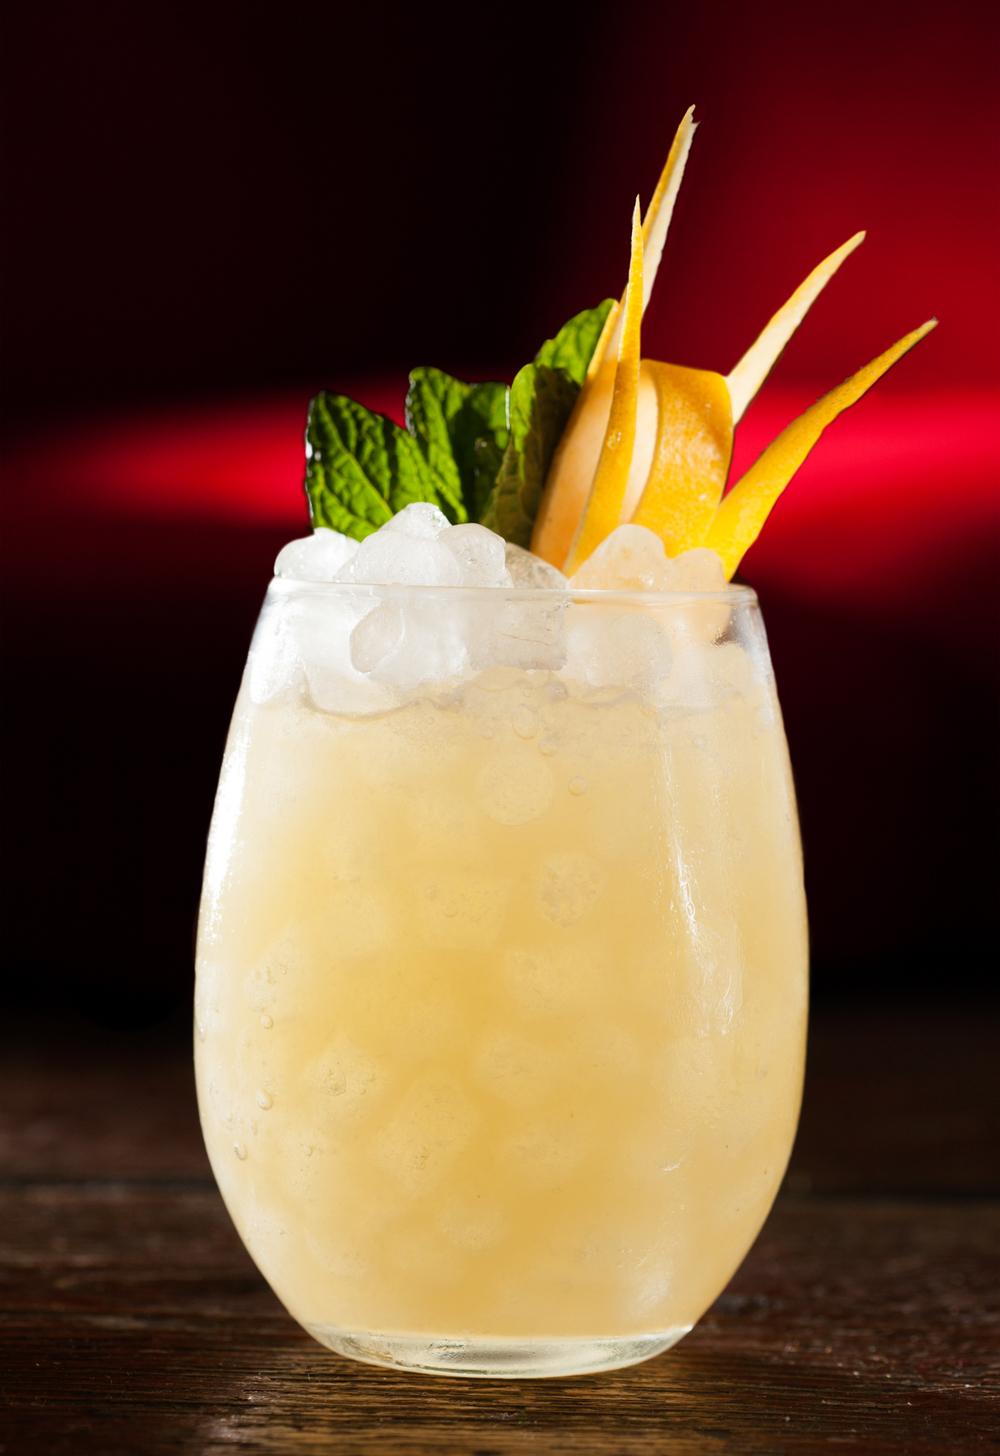 mple-papagalos-drink.jpg